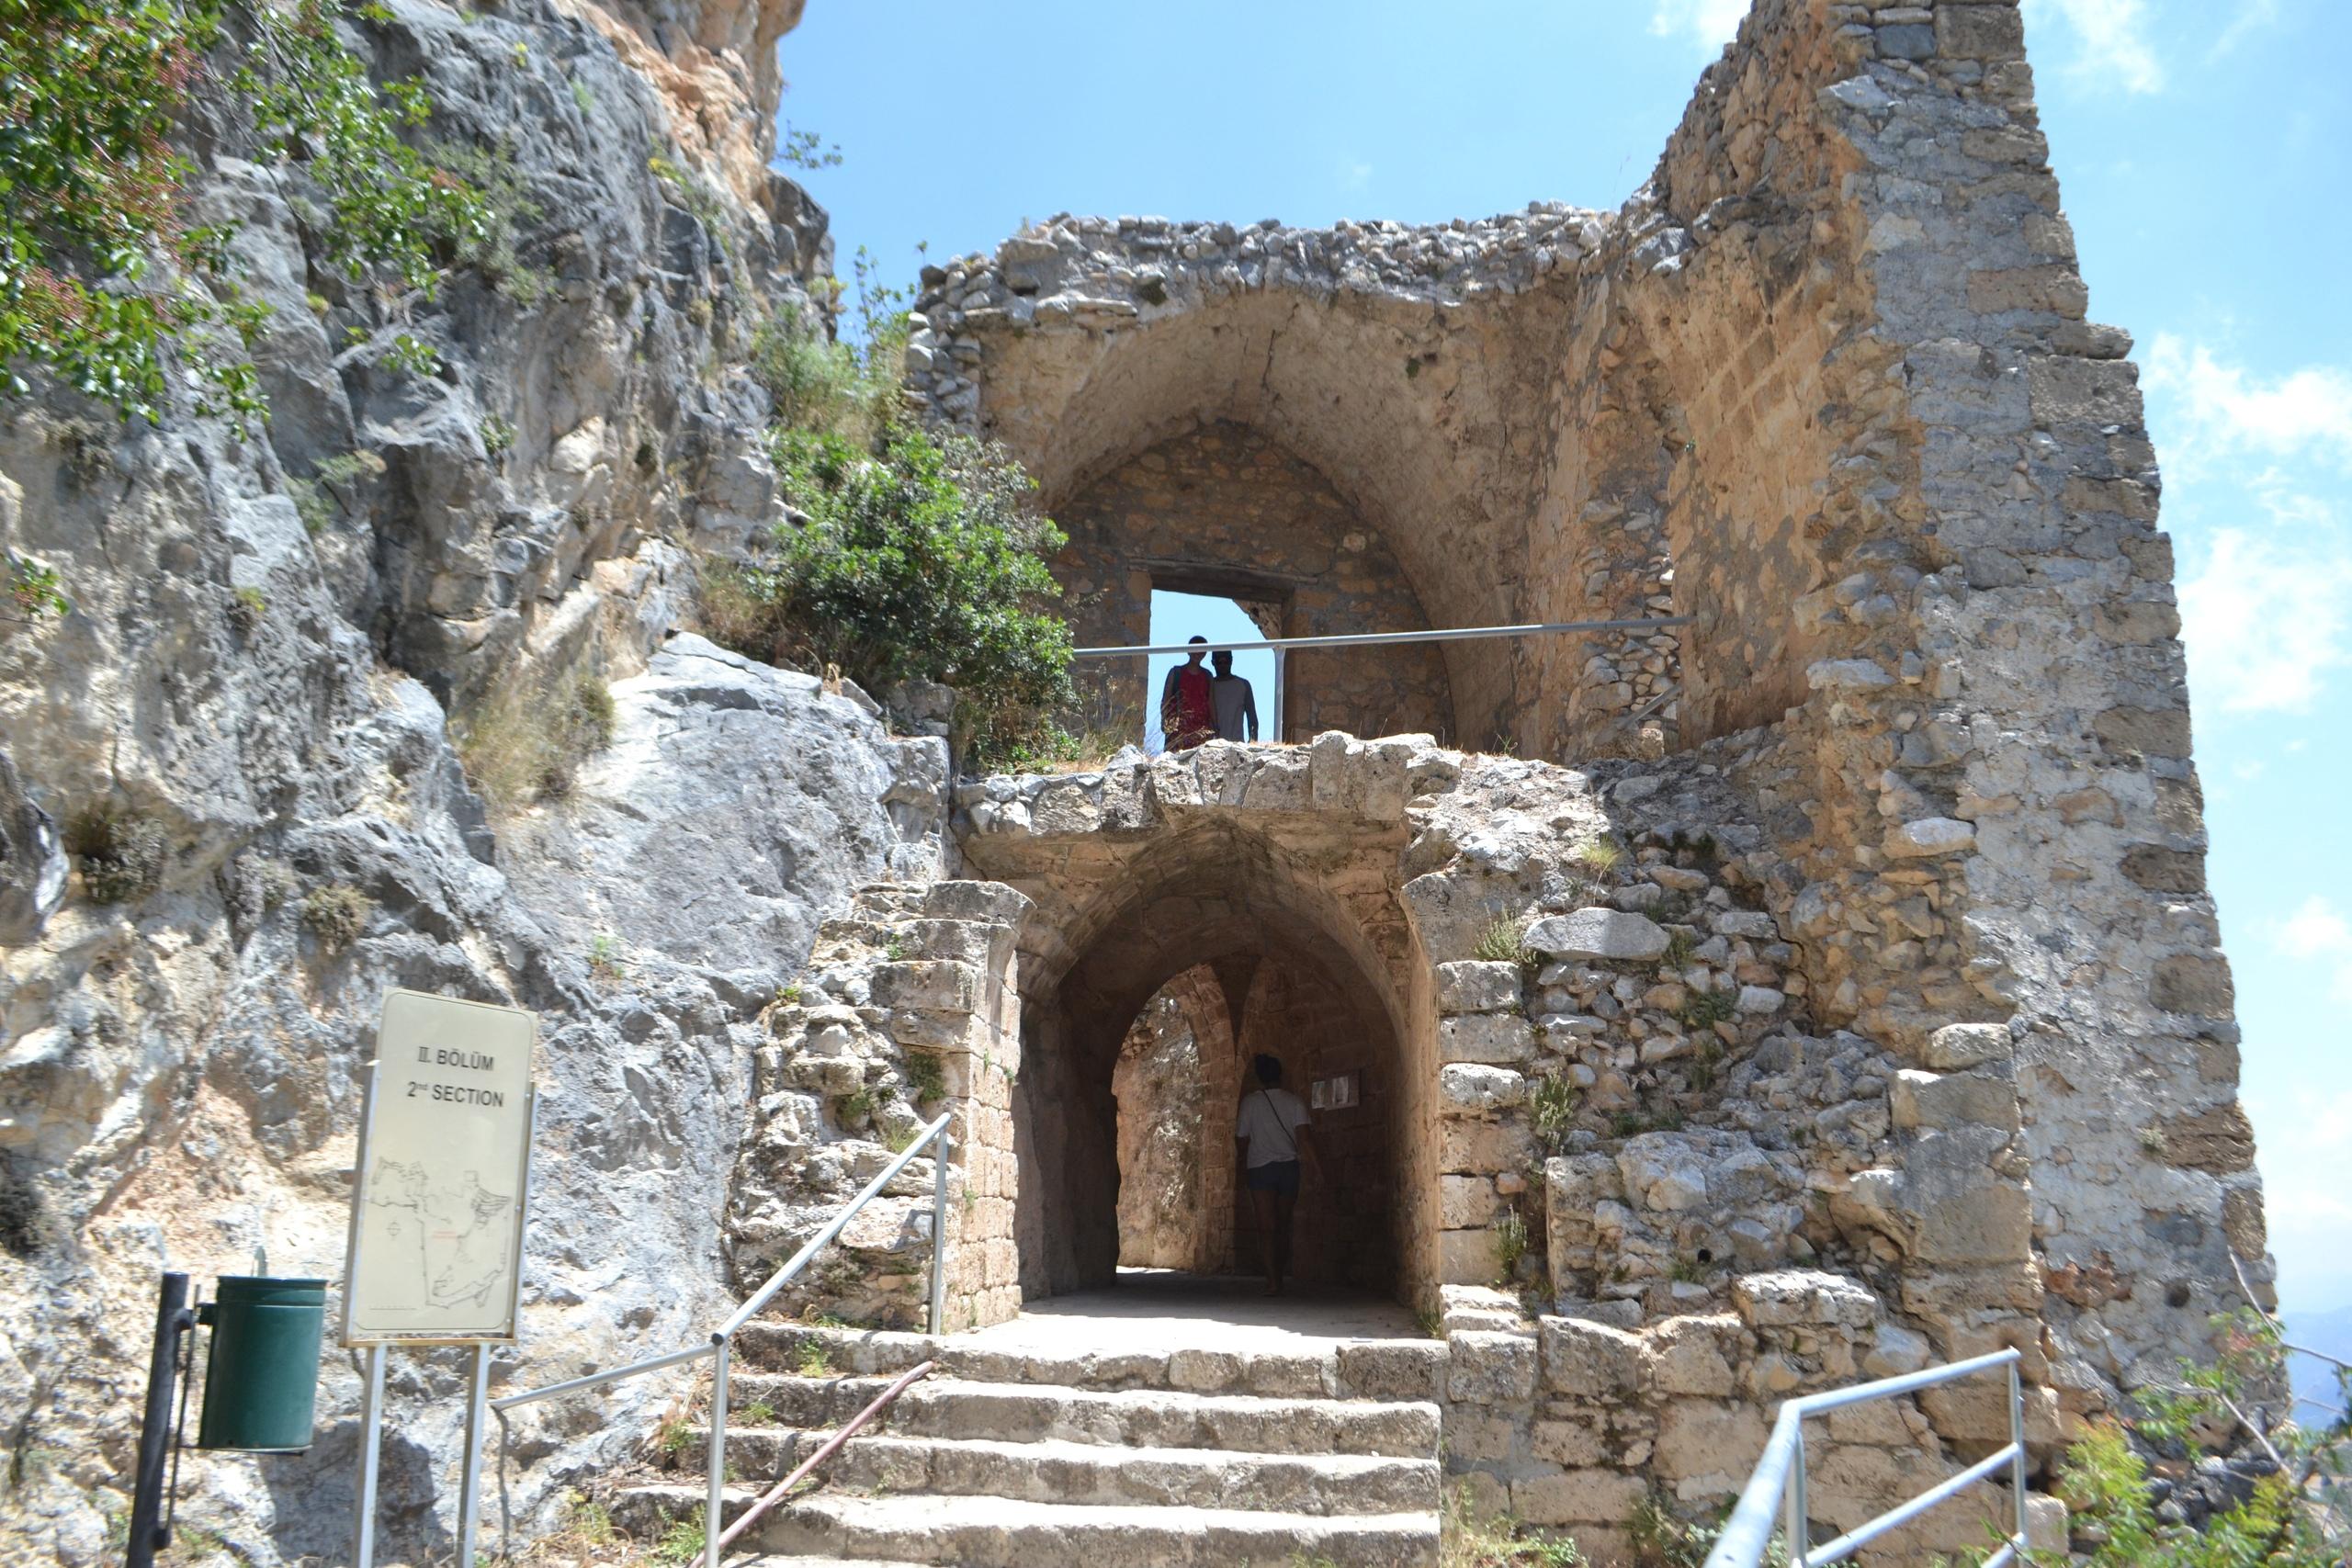 Северный Кипр. Замок Святого Иллариона. (фото). Y_W8qJdSKK8